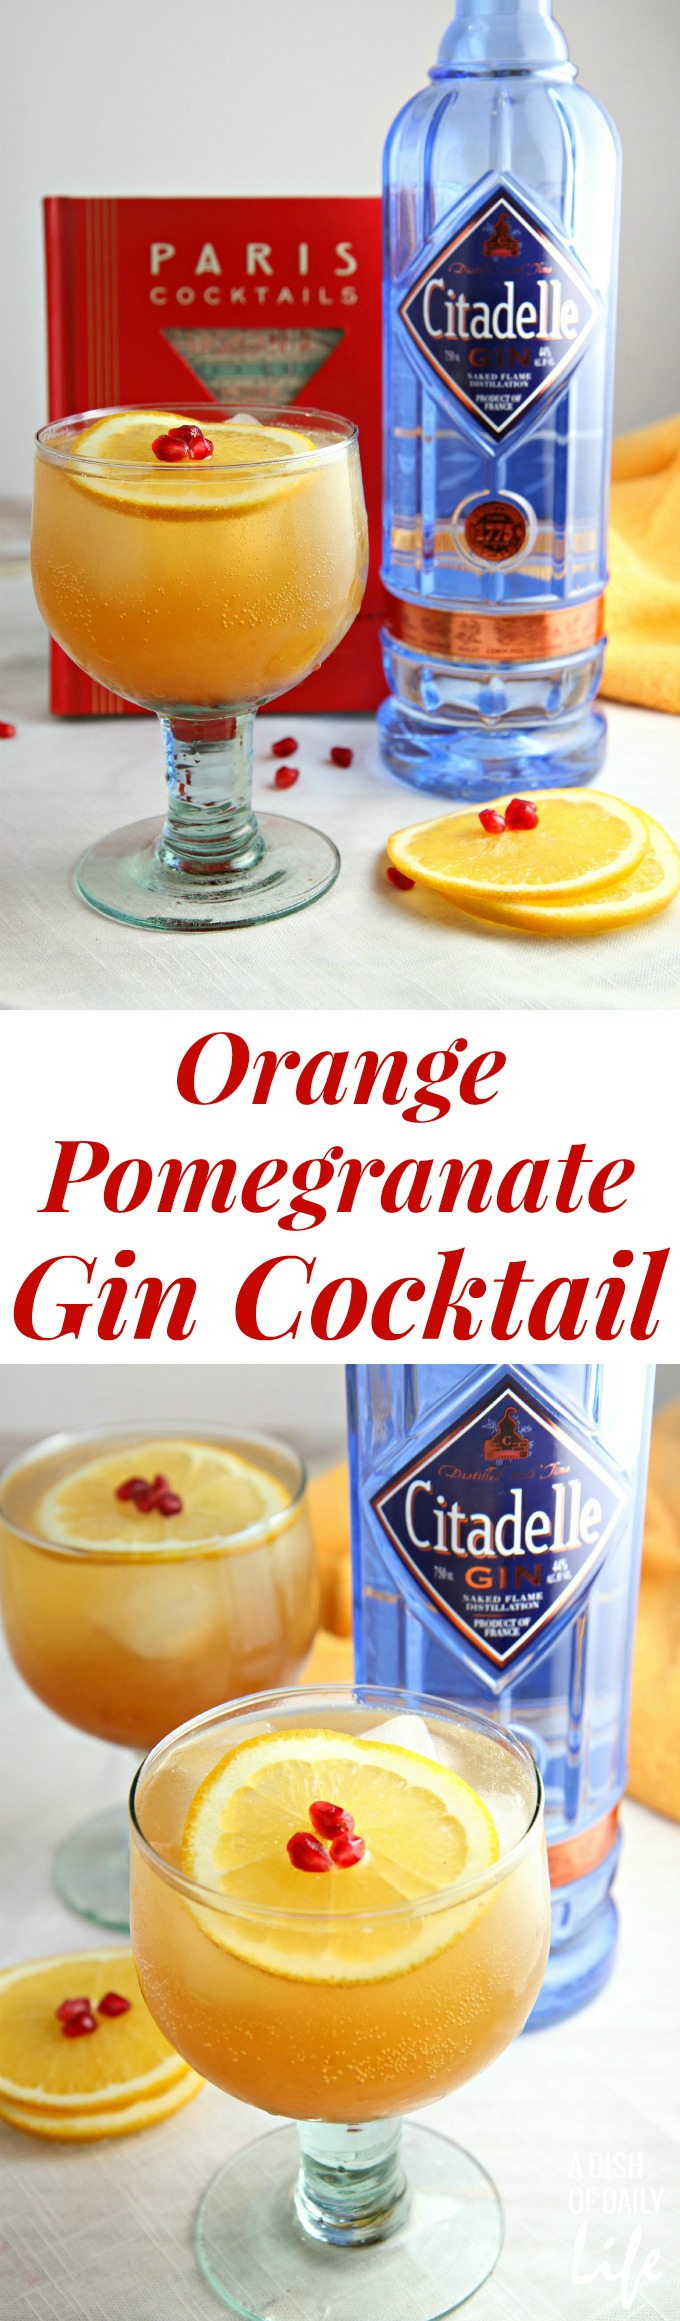 Orange Pomegranate Gin Cocktail